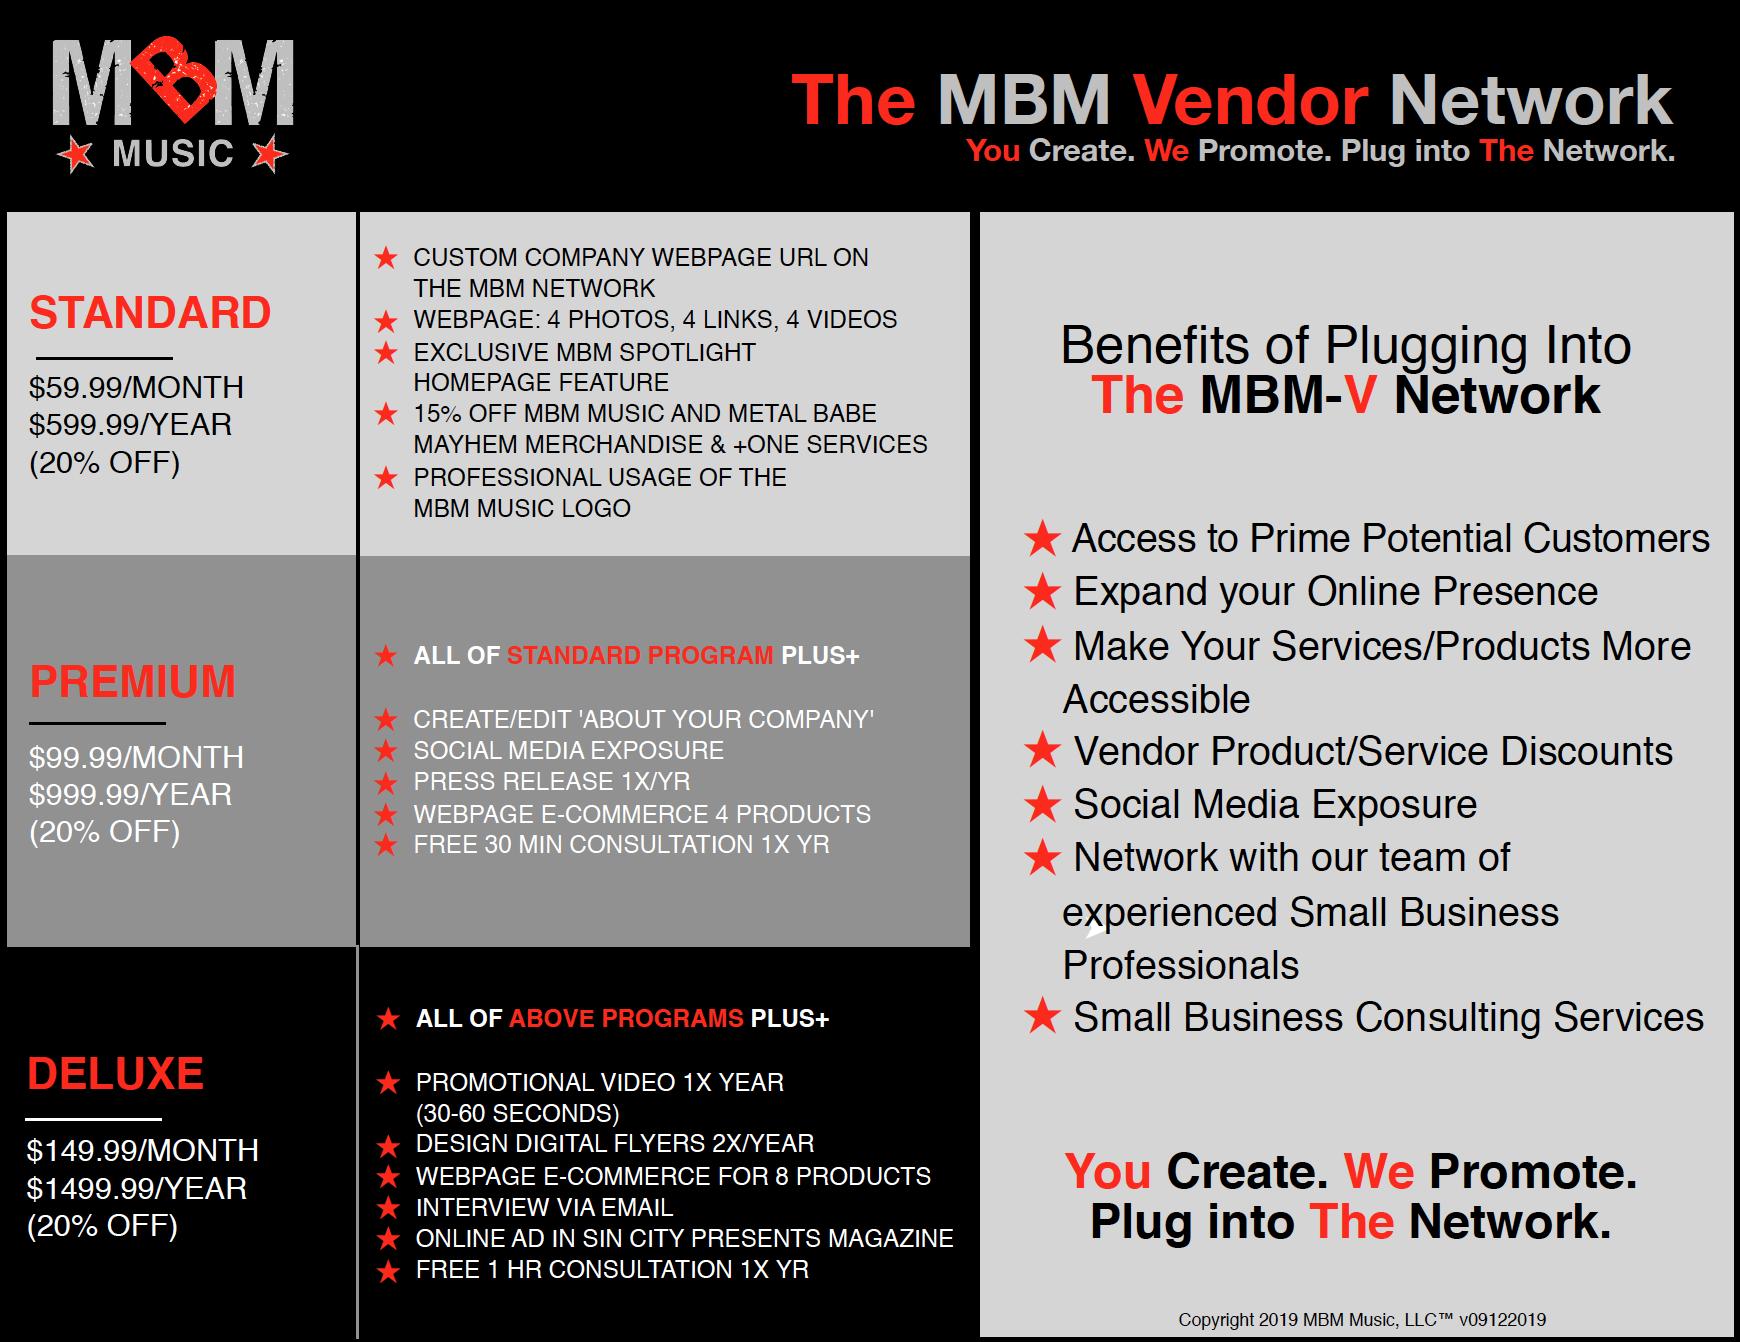 MBM Music Vendor One Sheeter 9 2019.png